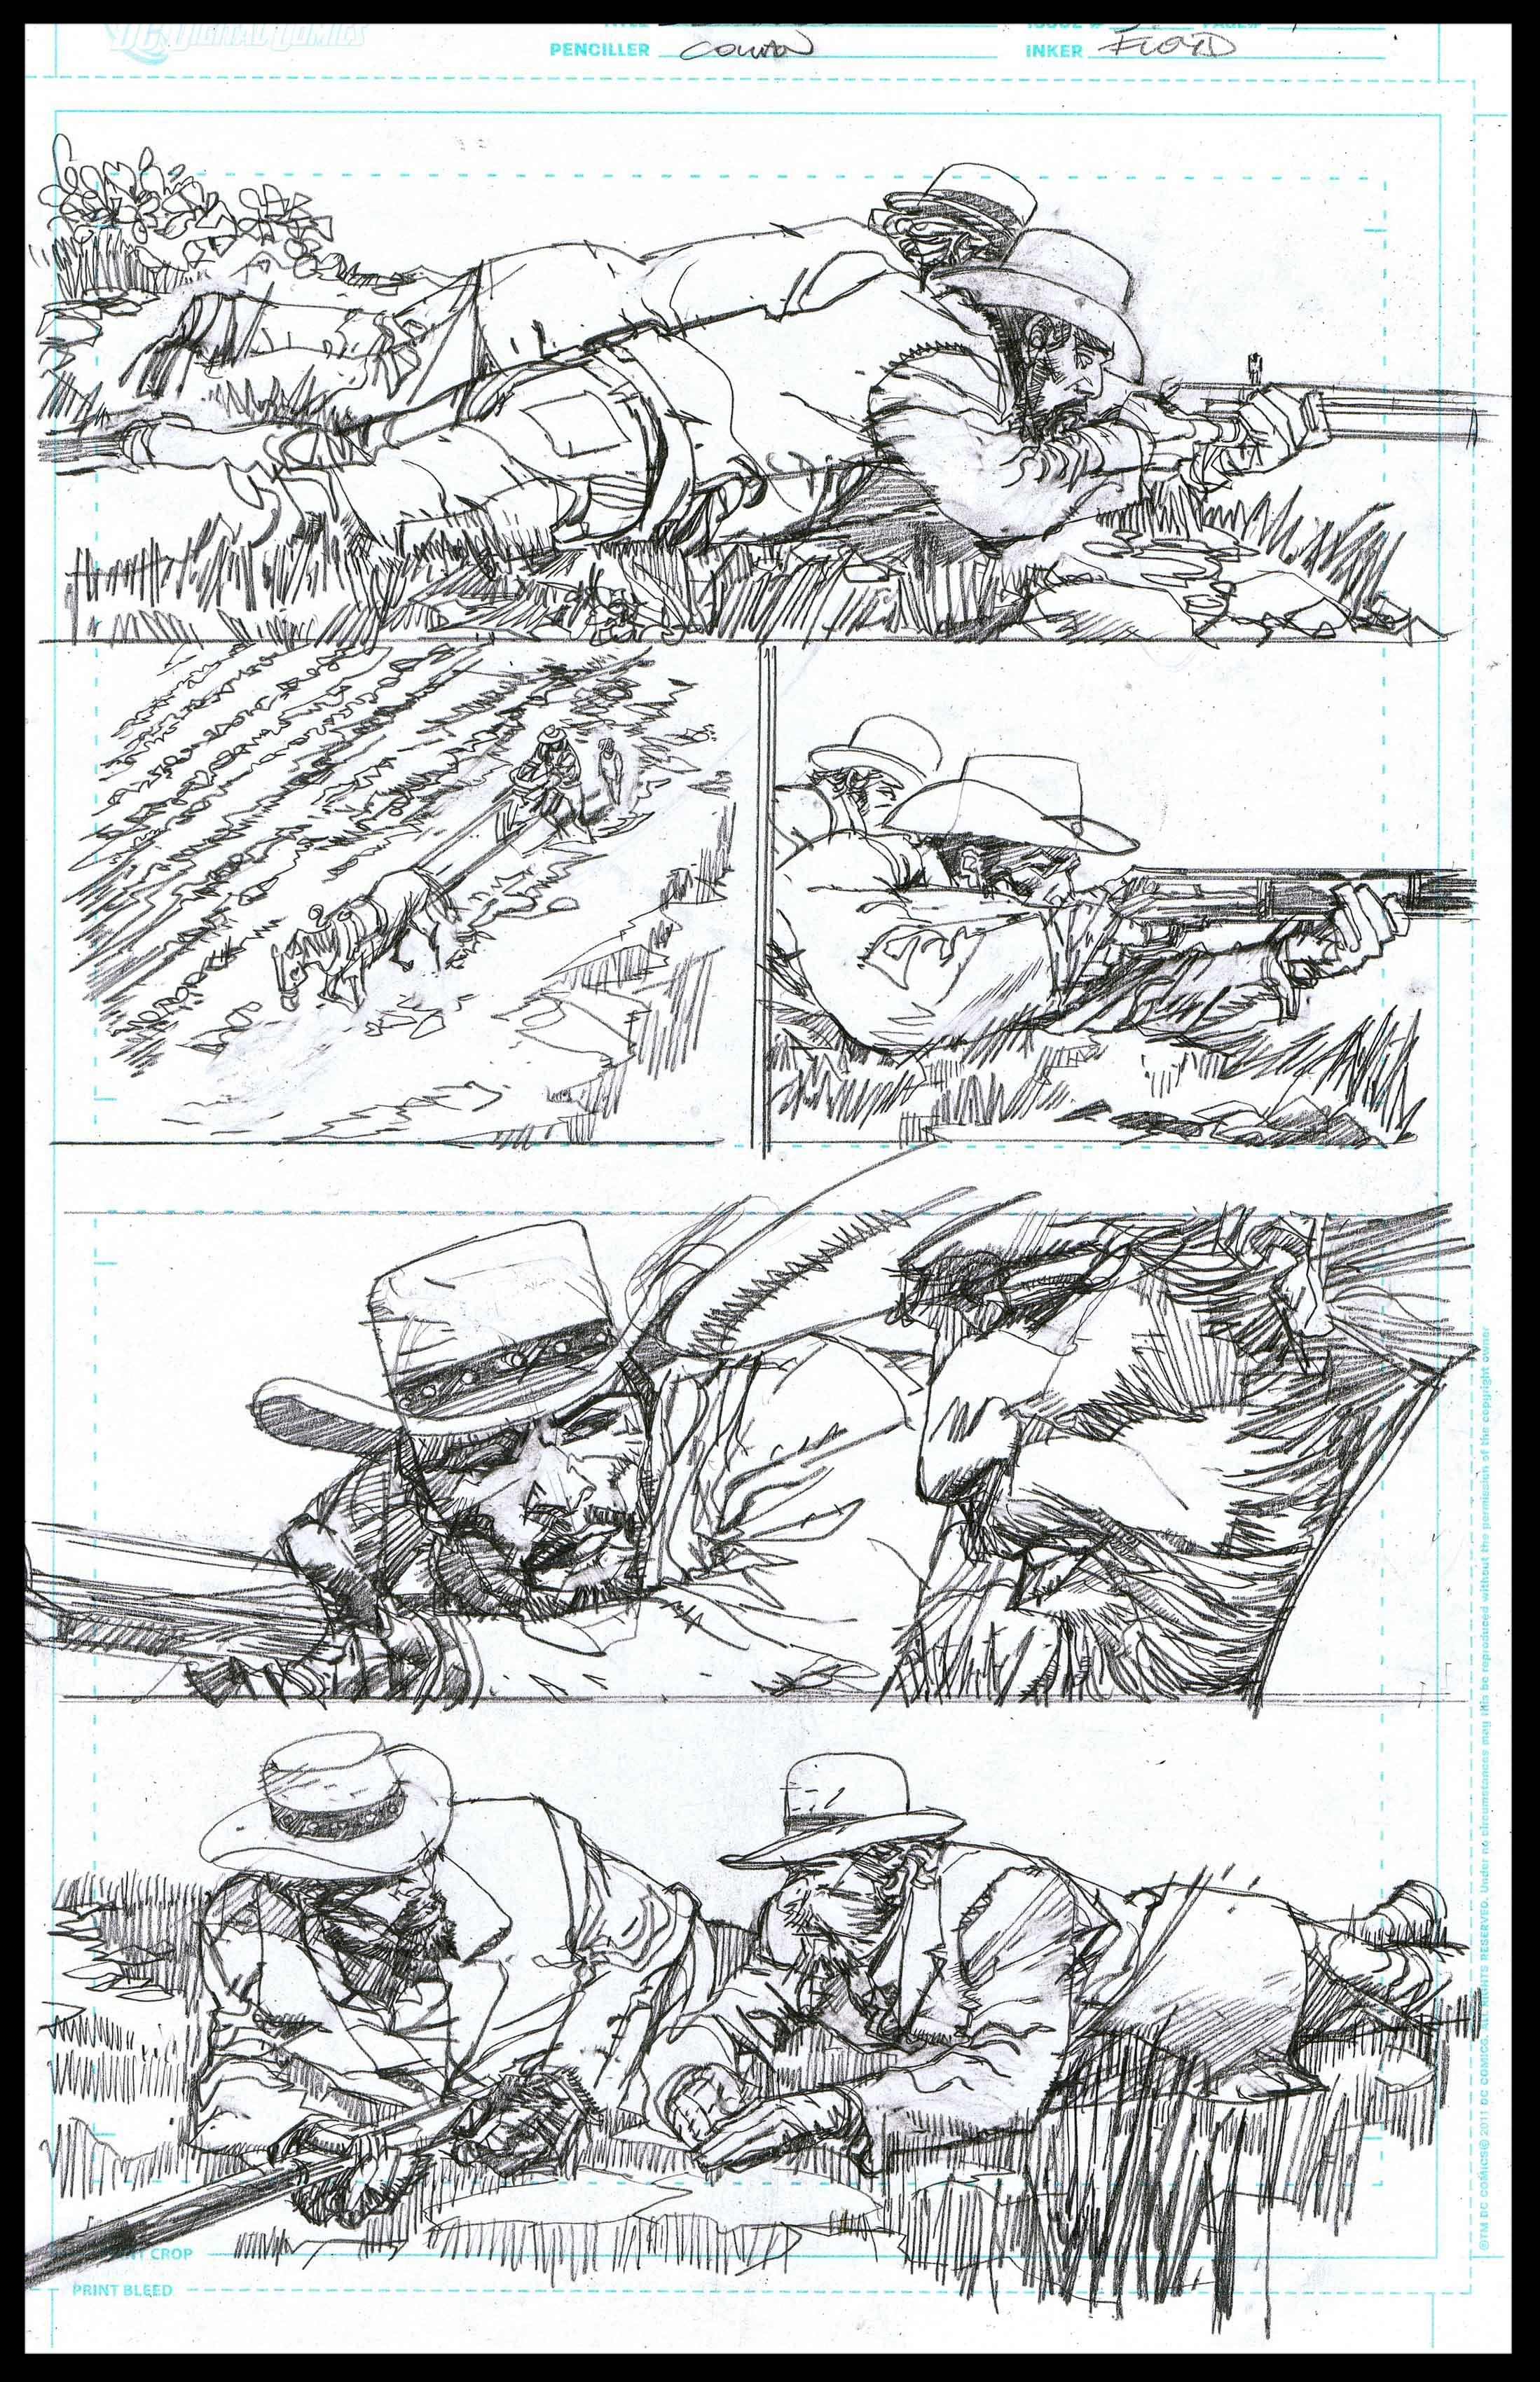 Django Unchained #3 - Page 4 - Pencils